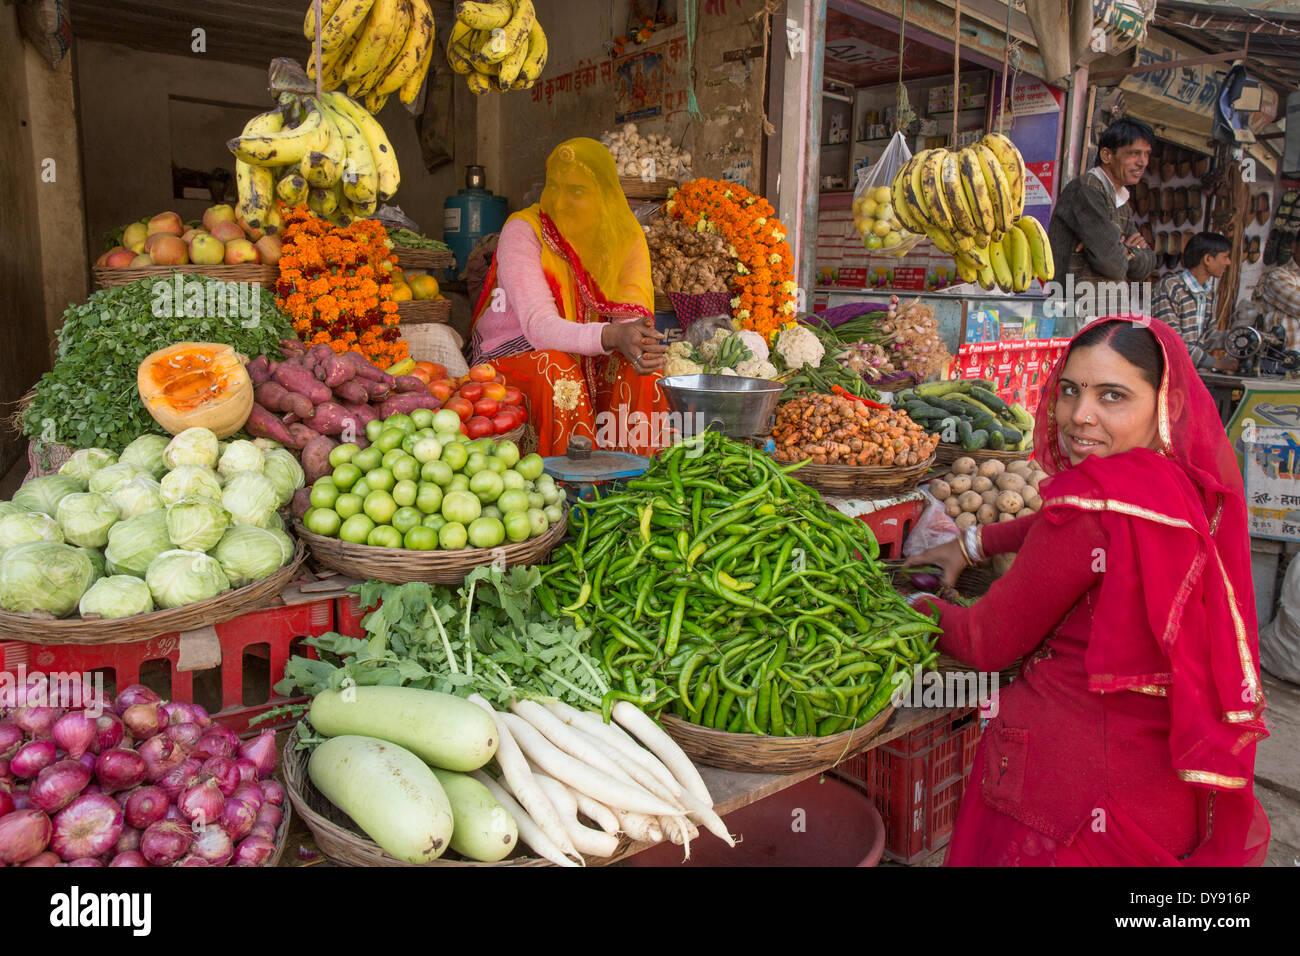 Mercato di verdure, India, Asia, India, mercato, verdure, donna, tradizionale, Indiana, Rajasthan, Immagini Stock